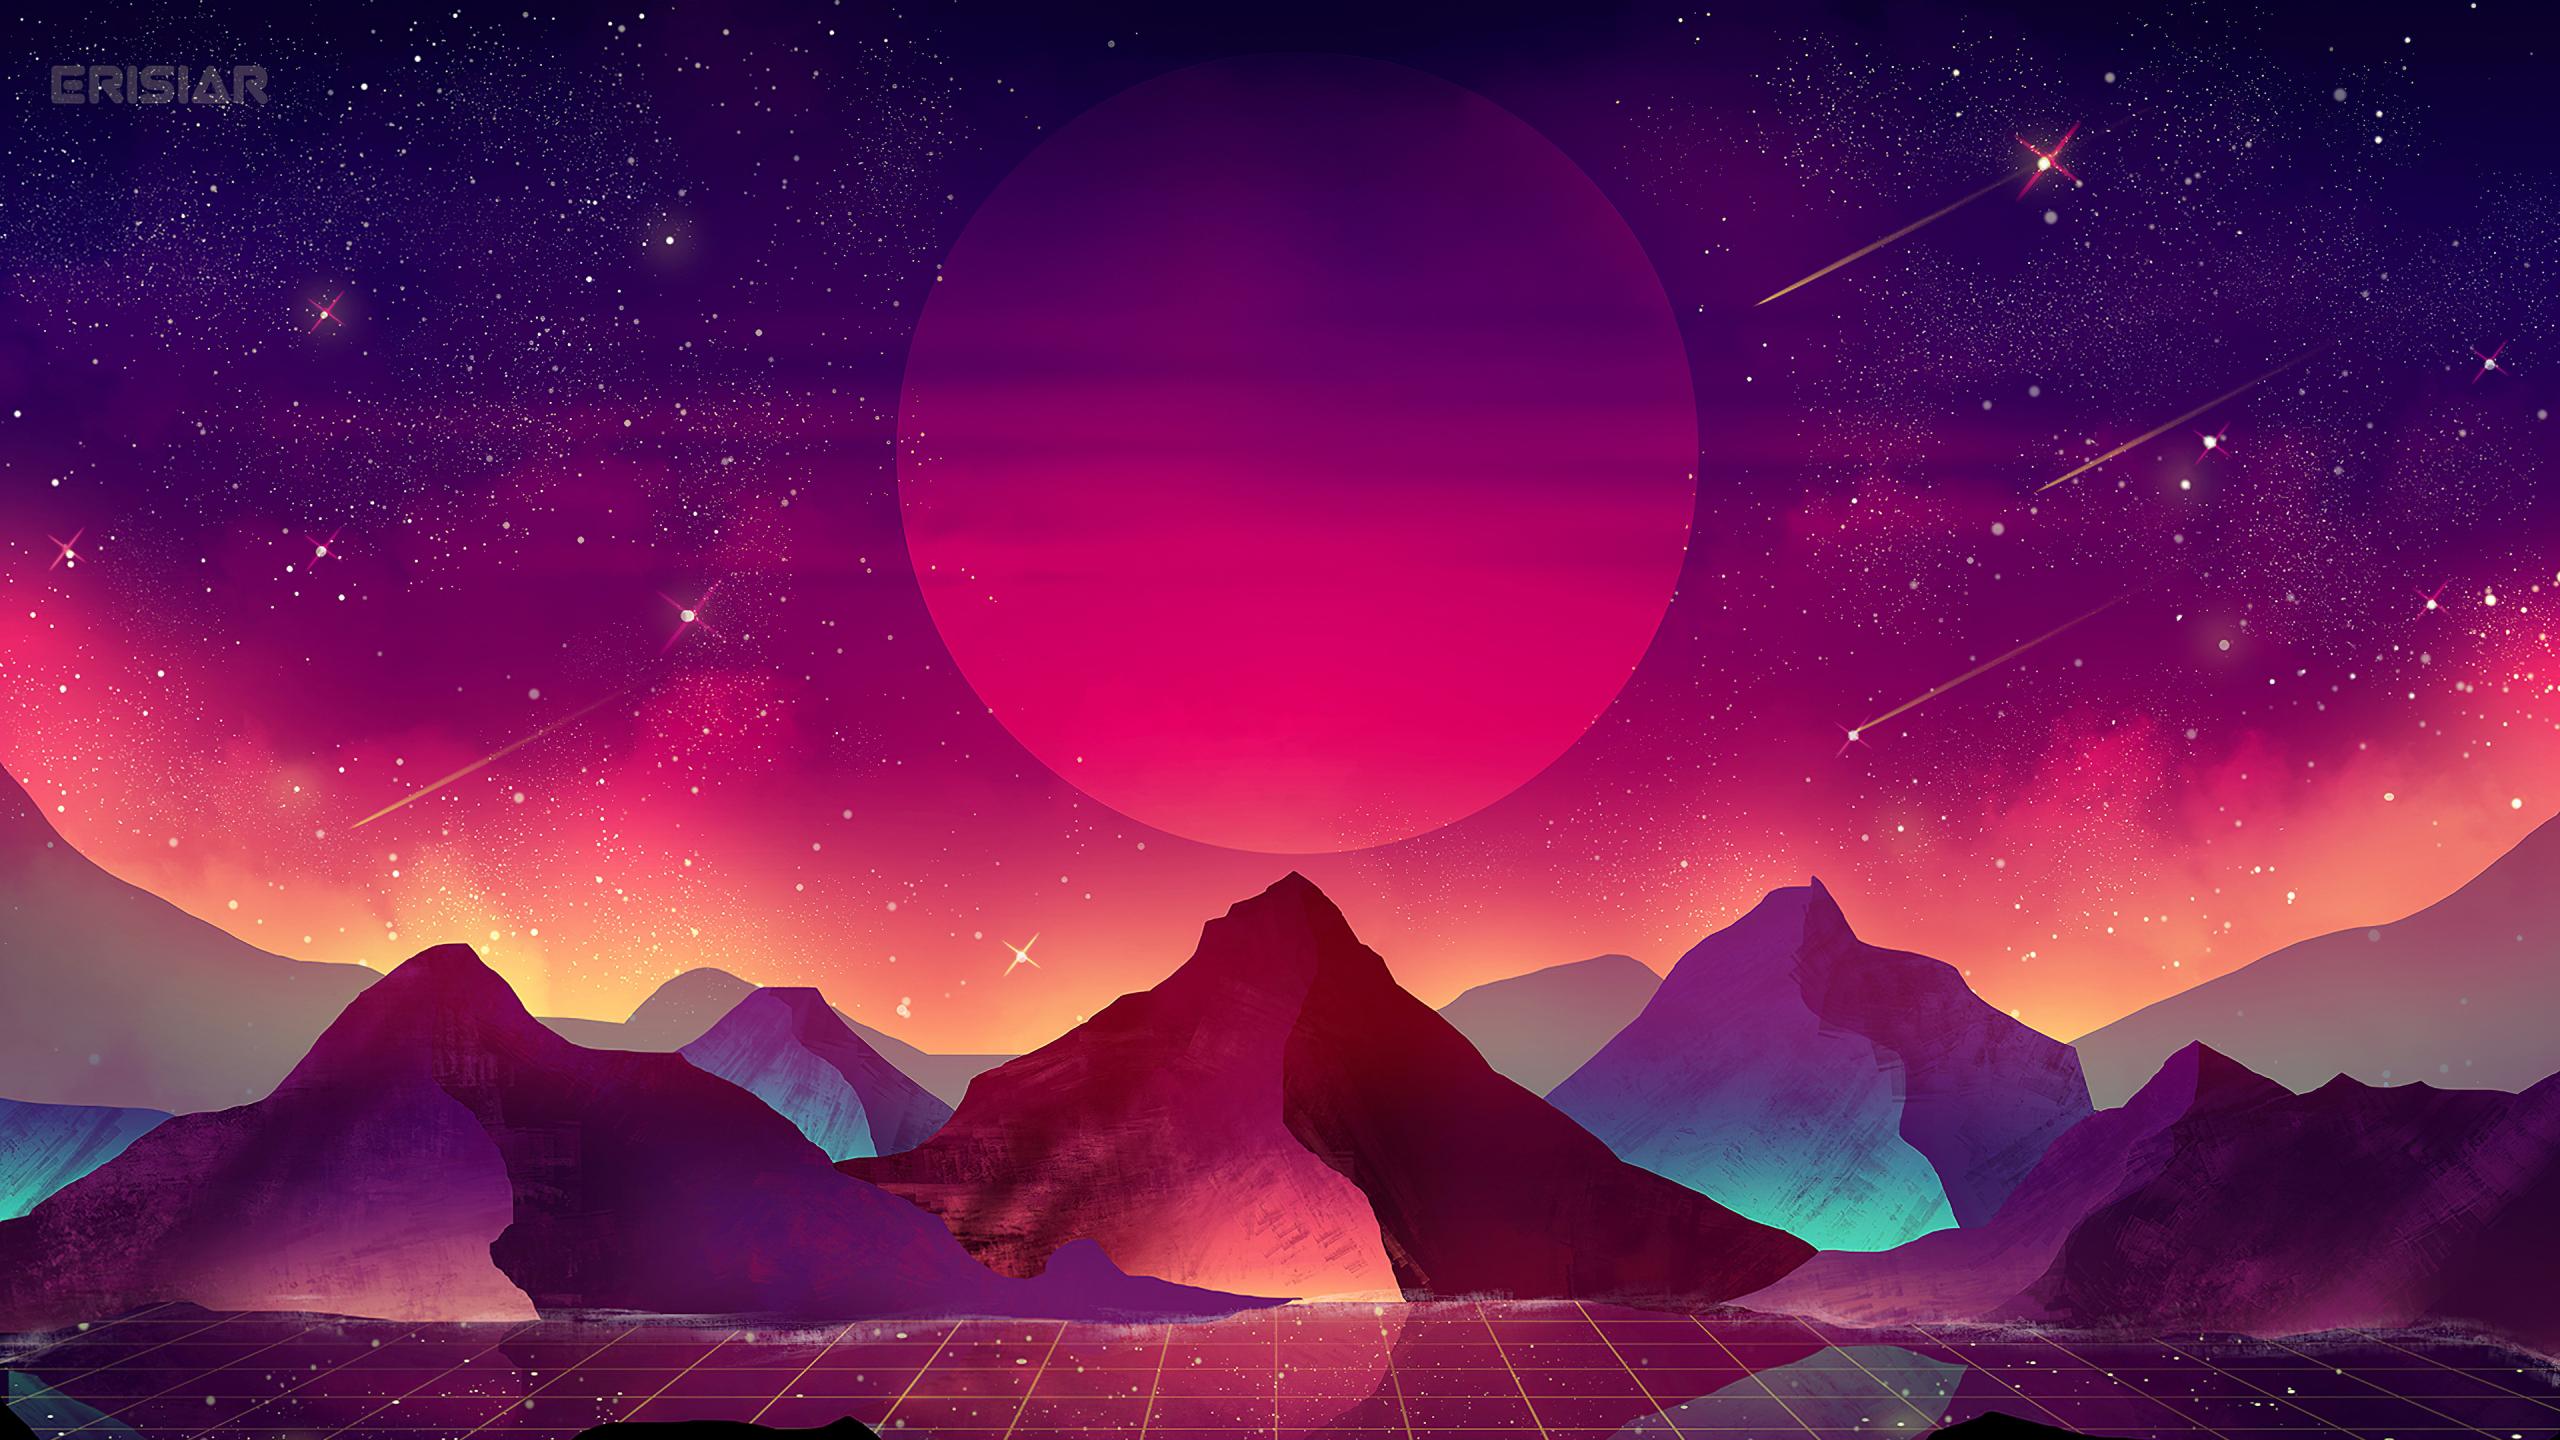 Download 2560x1440 Wallpaper Terrain Vaporwave Moon Mountains Landscape Art Dual Wide Widescreen 16 9 Widescreen 2560x1440 Hd Image Background 23290